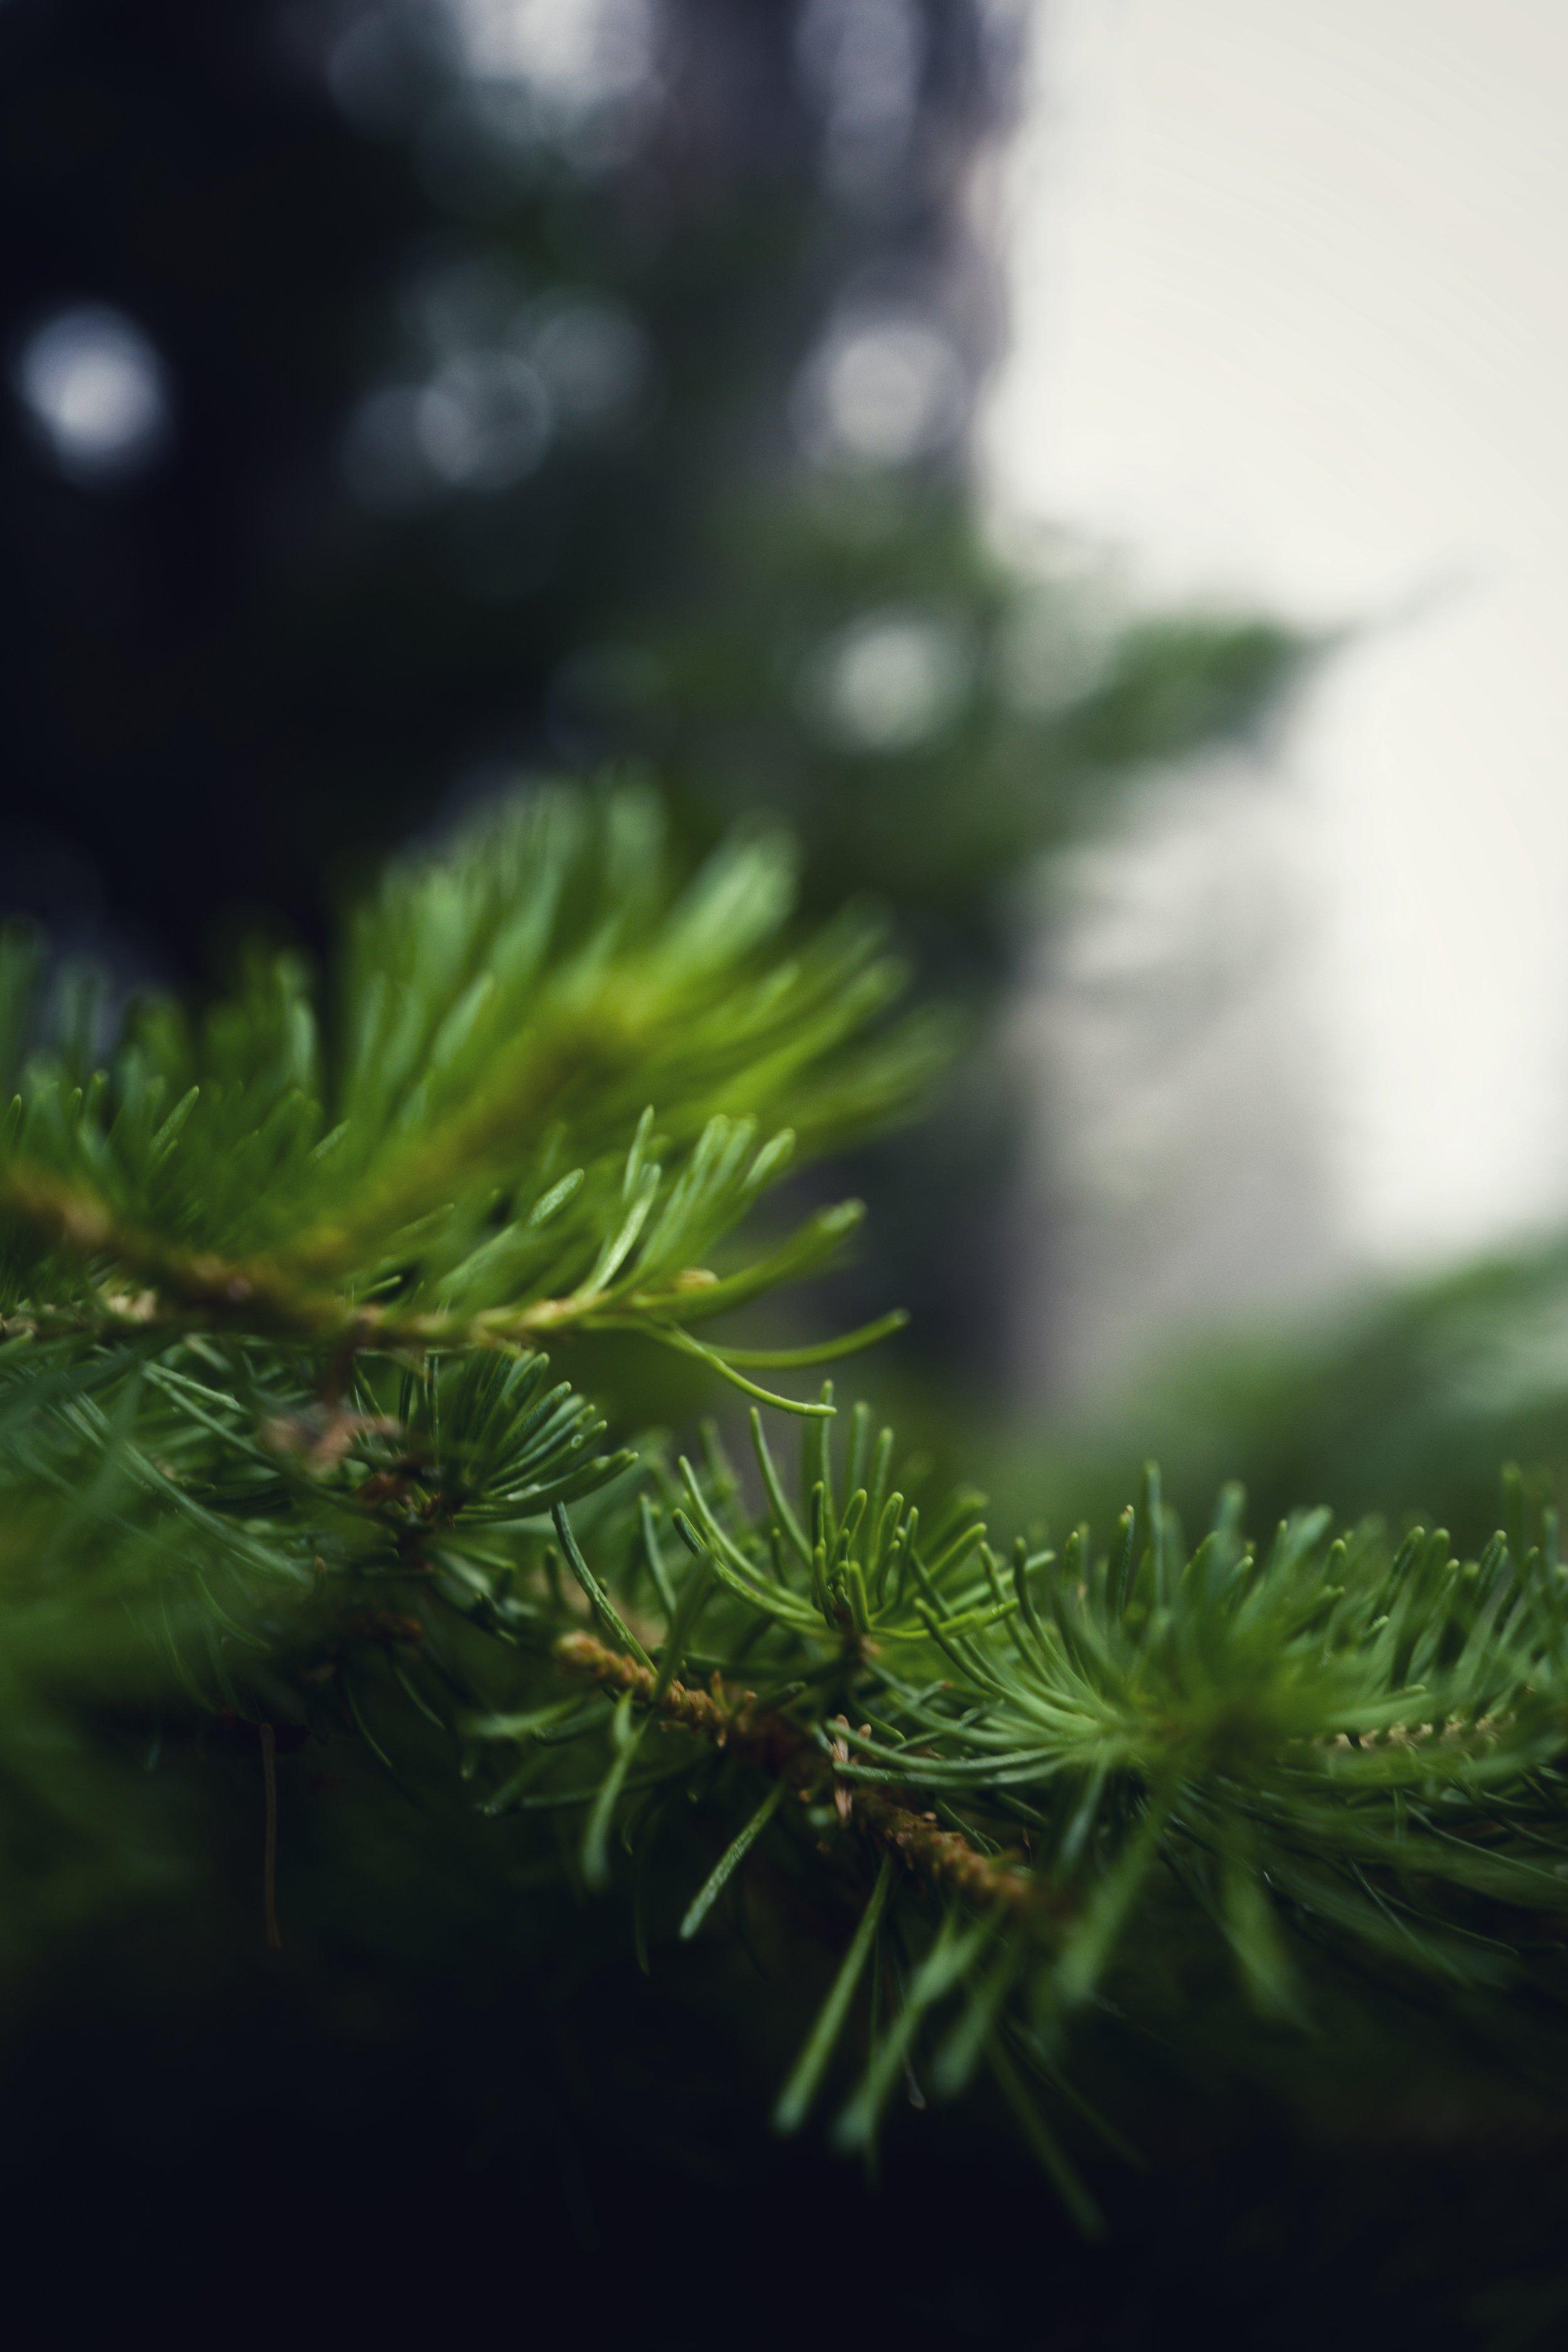 Pine Up Close.jpg